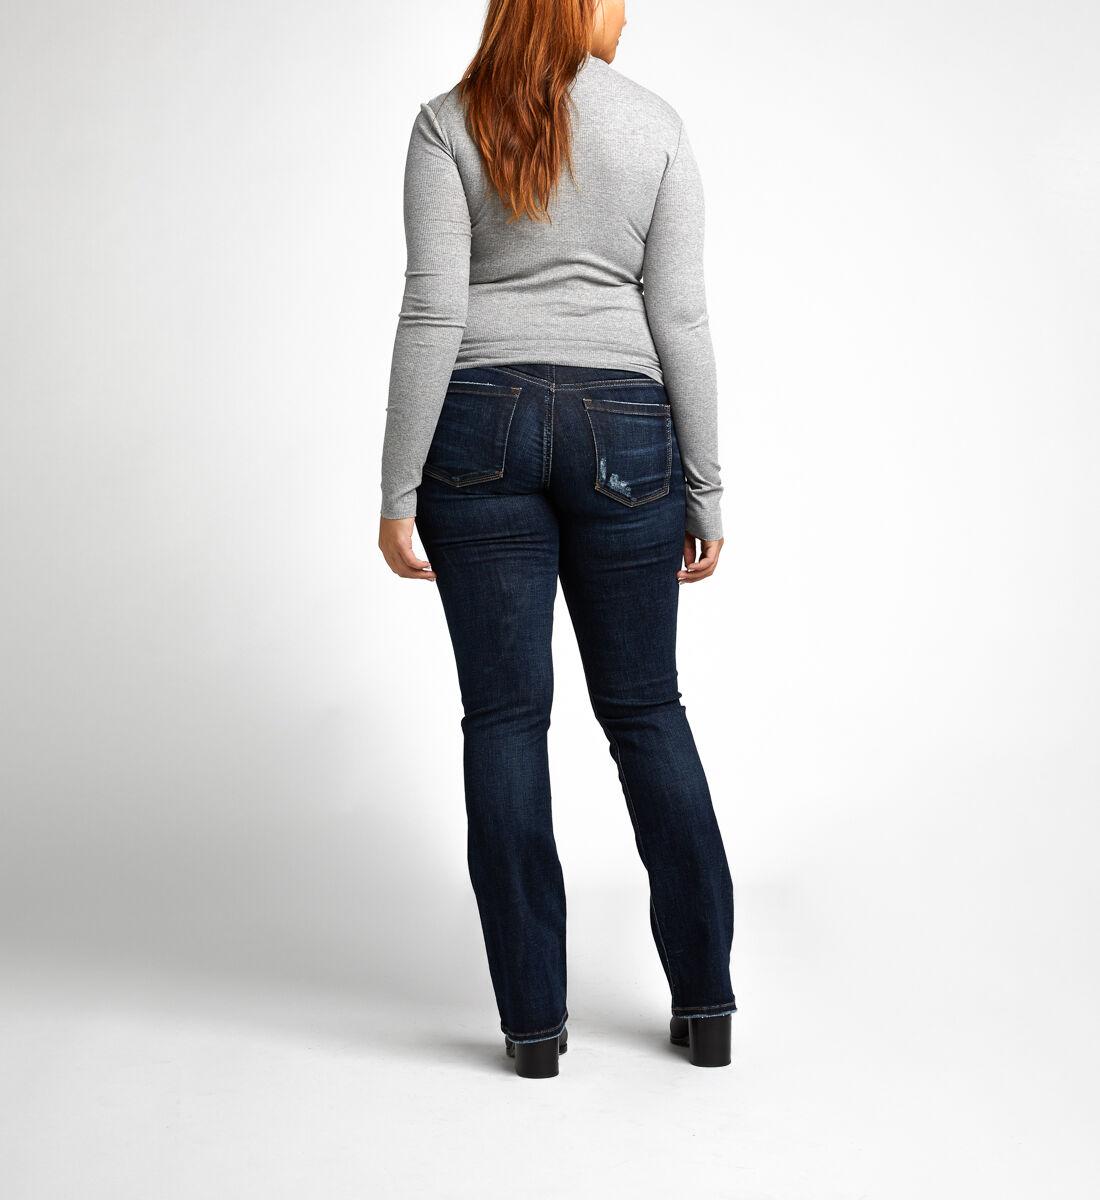 Elyse Slim Bootcut Maternity Jeans Side